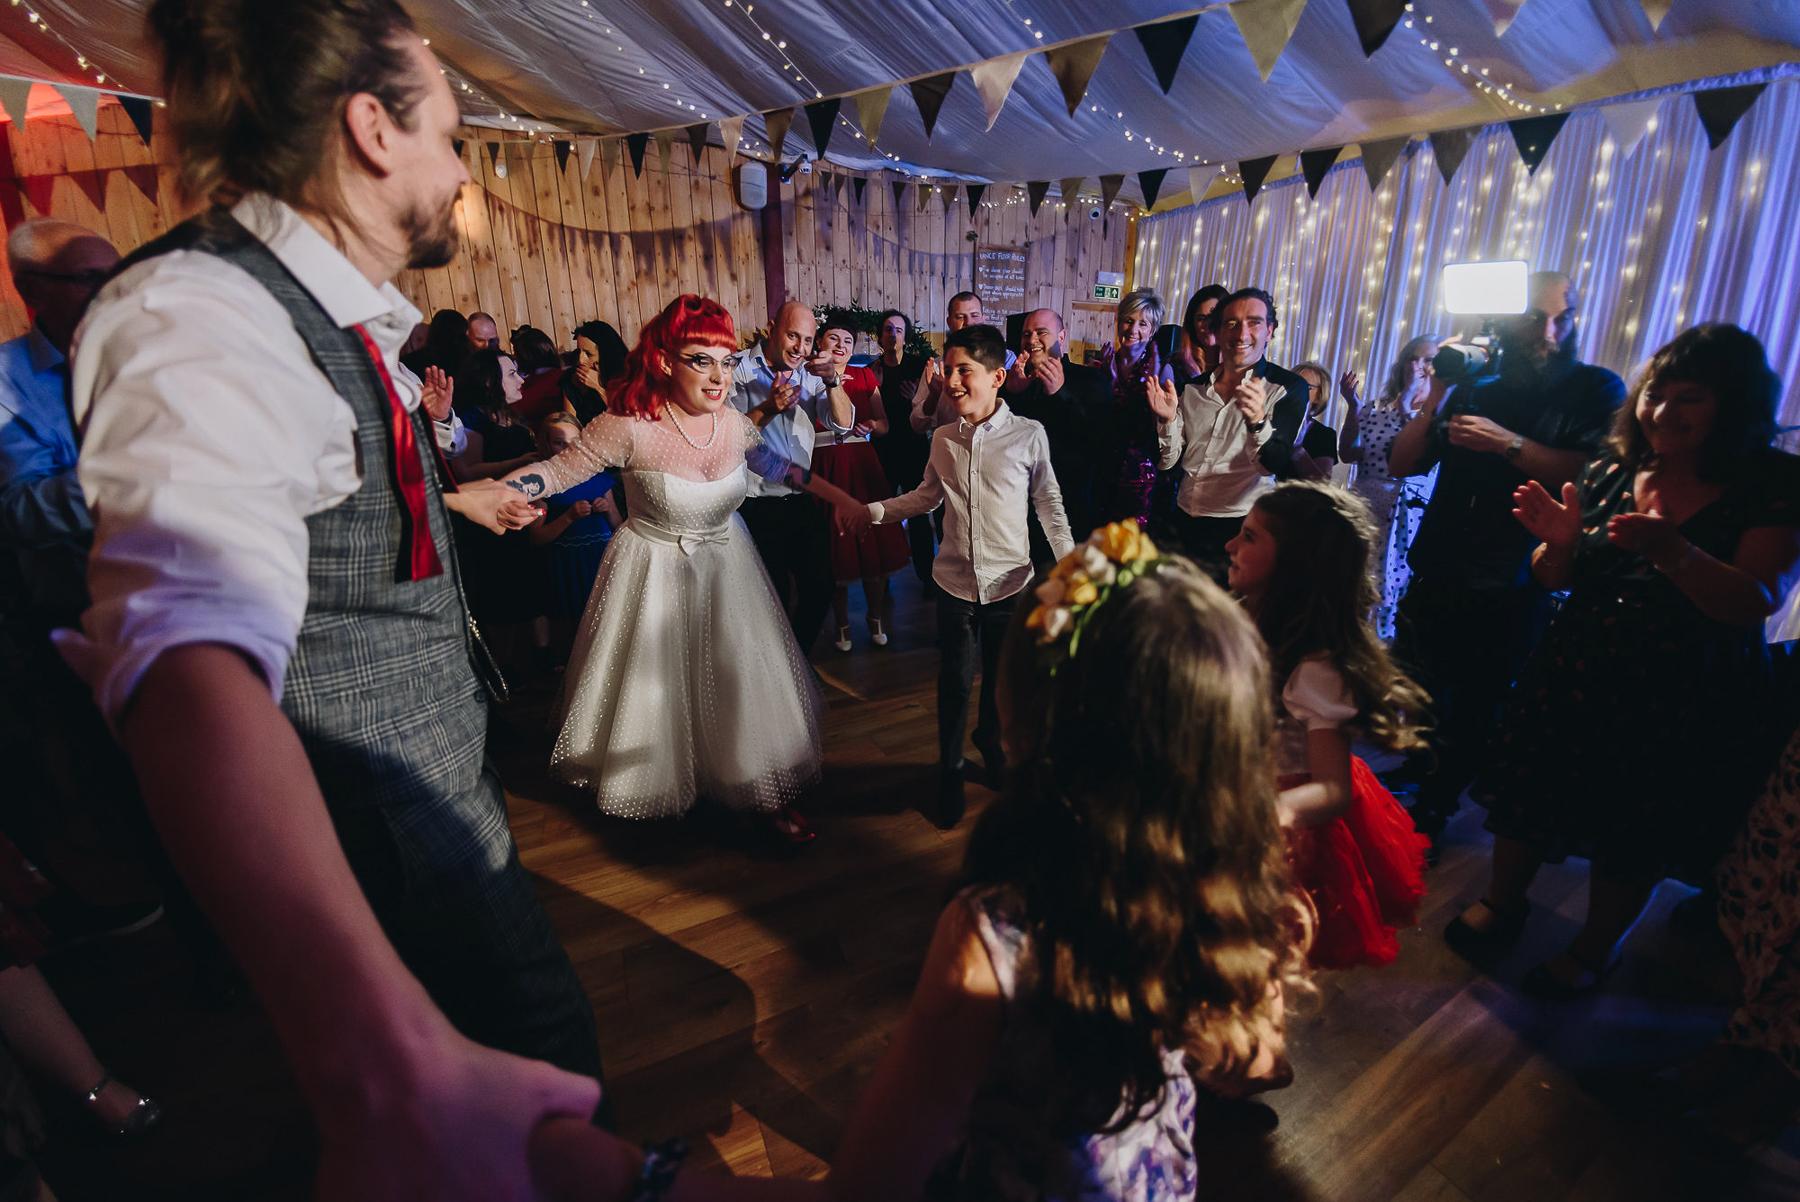 Wellbeing_Farm_Wedding_Photography_The_Pin-Up_Bride_Lara_Shaun-182.jpg